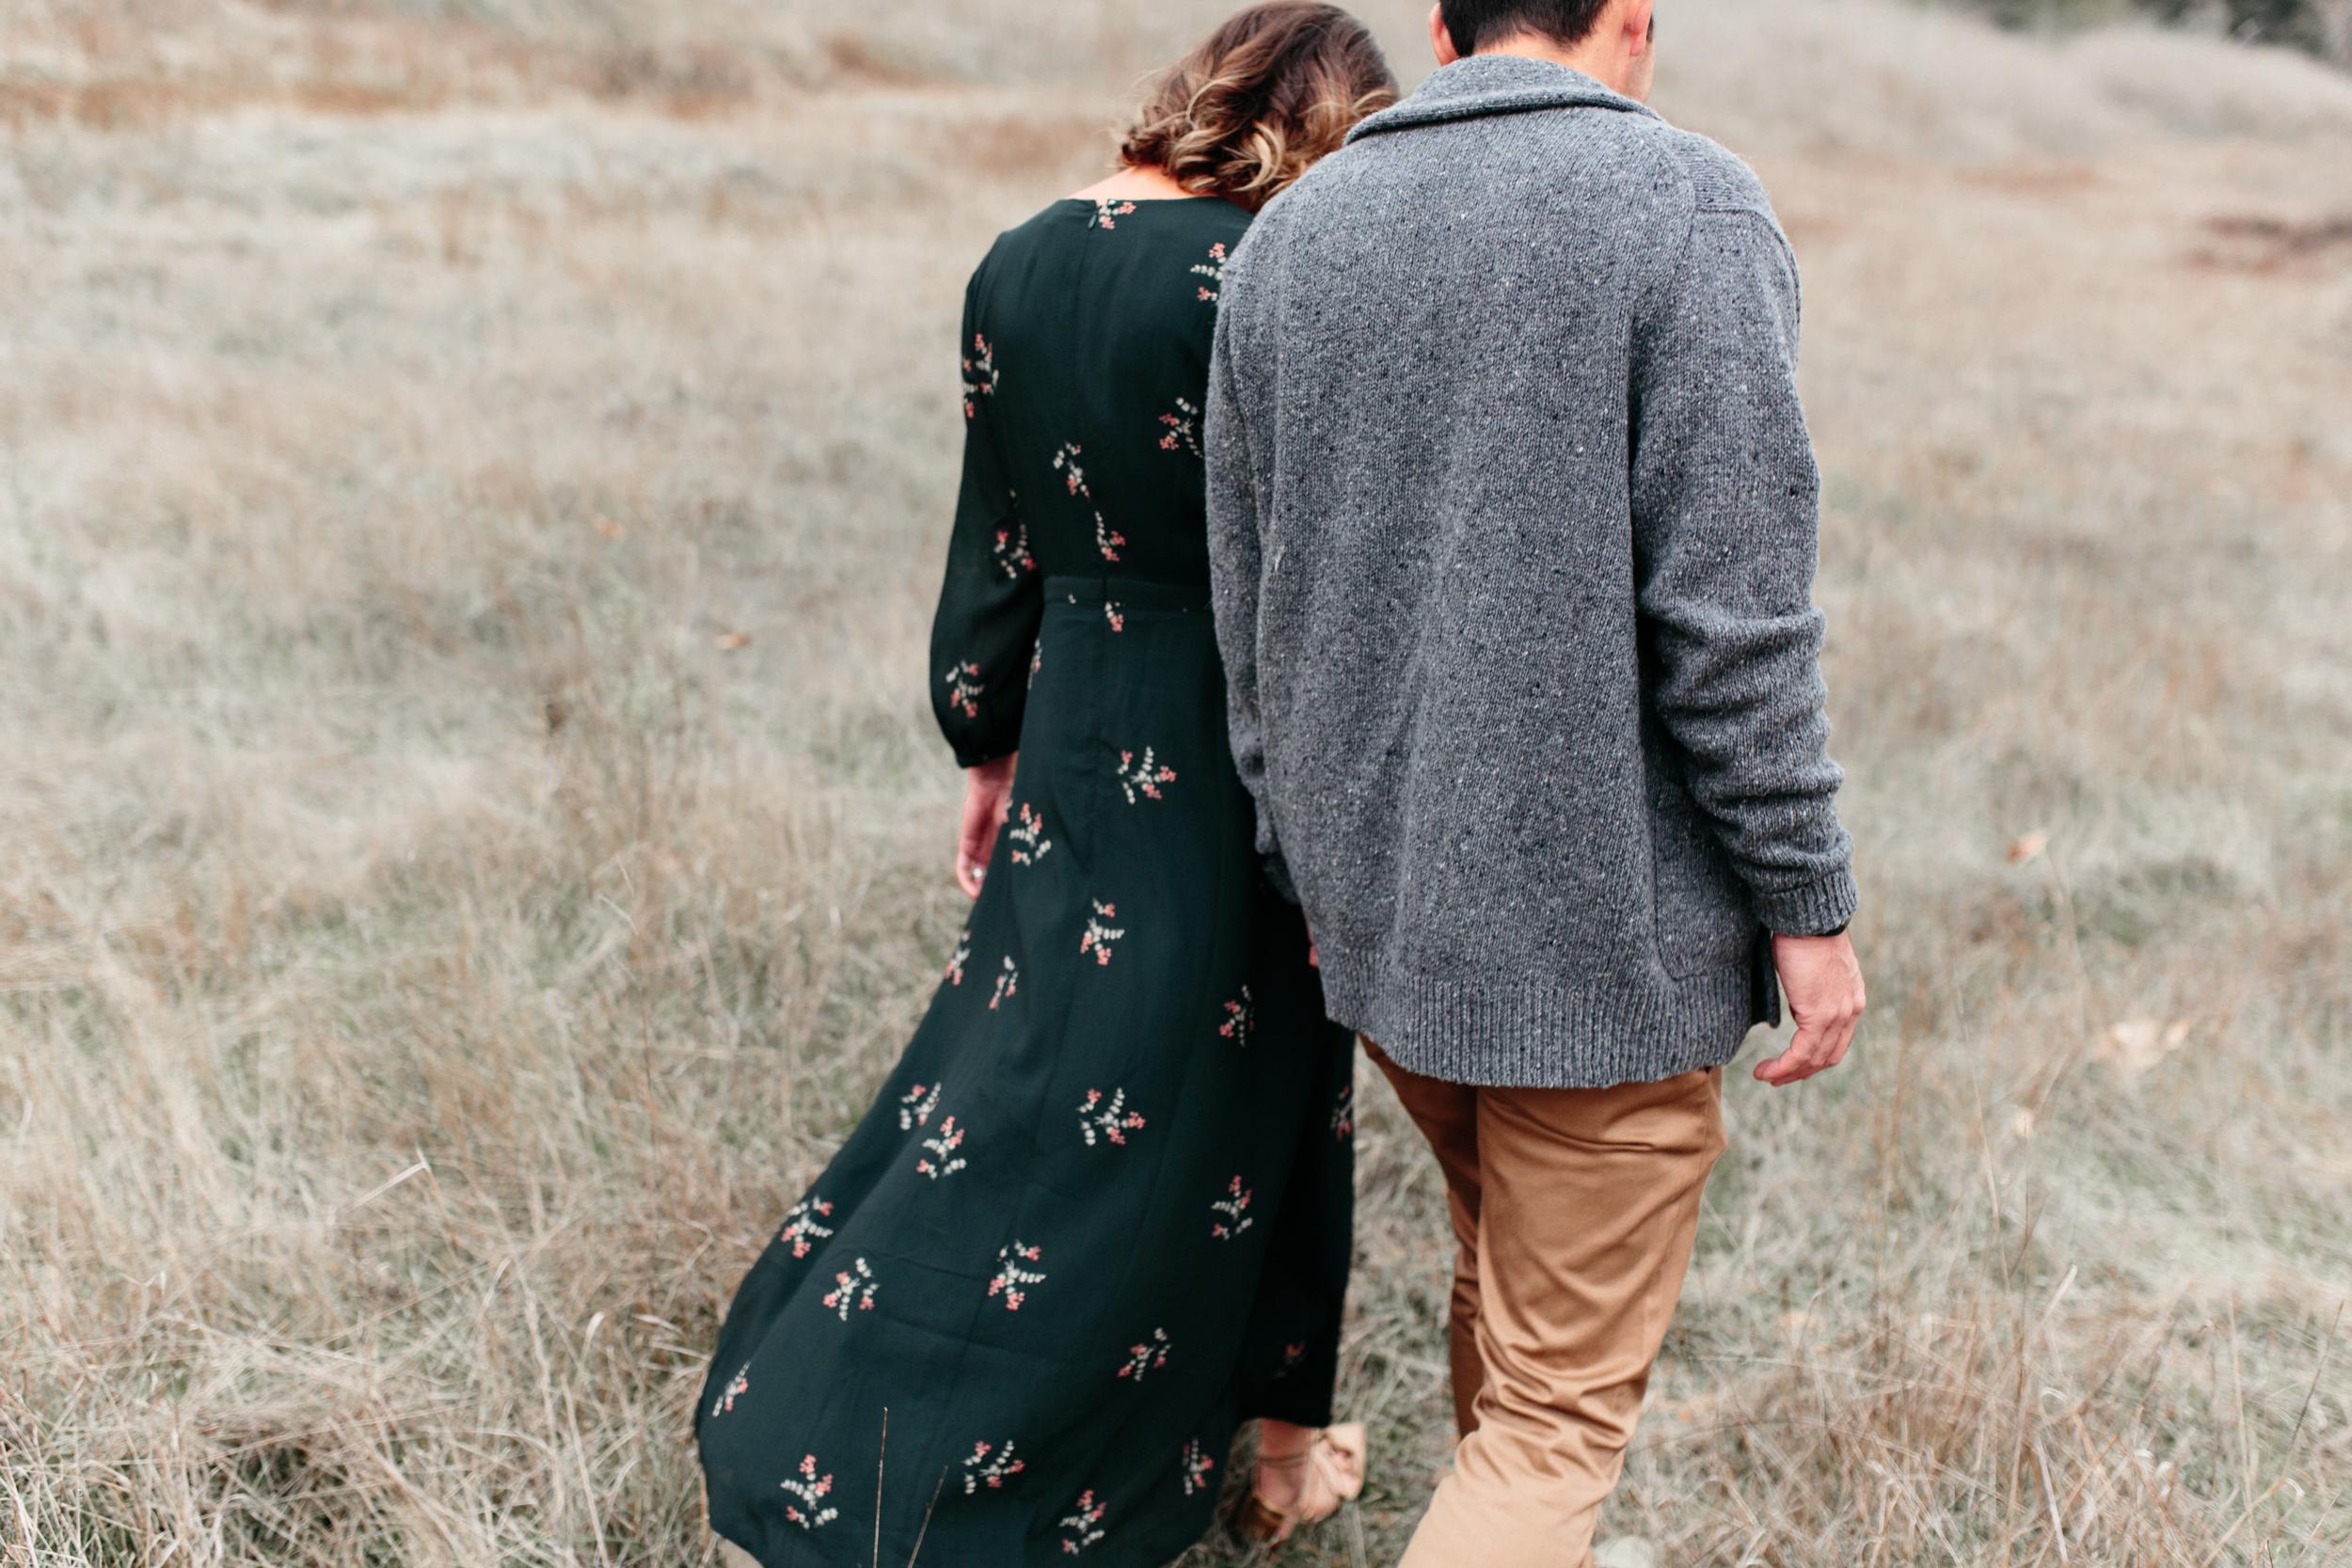 SamErica Studios - San Diego Photographer - Destination Wedding Photographer-1.jpg